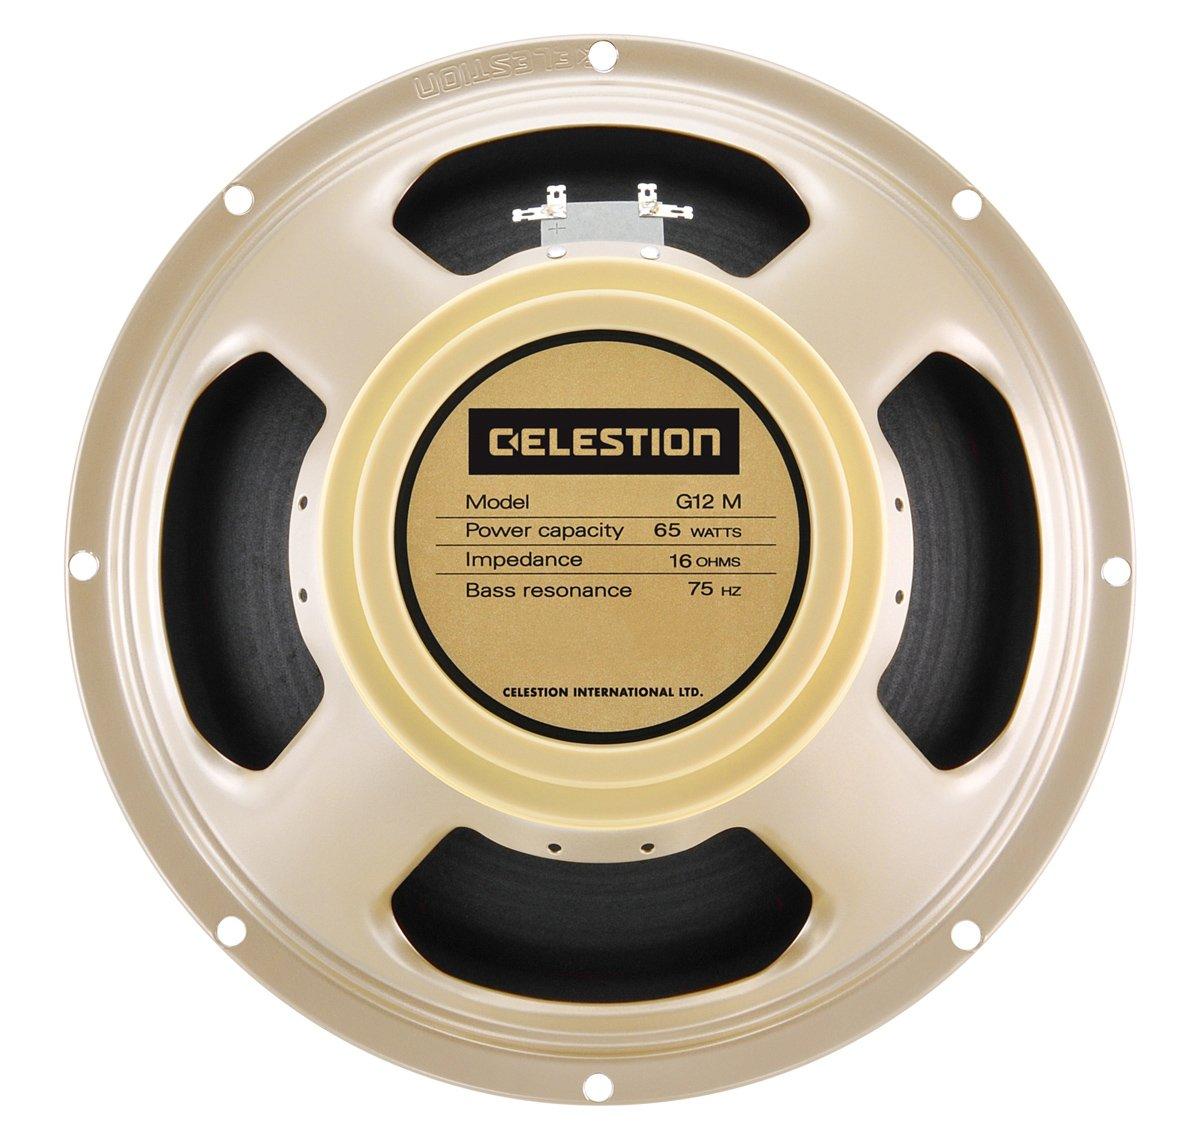 Speaker Celestion Classic G12 M CRE. 12 '65 W G12M-65 Creamback 16 ohm